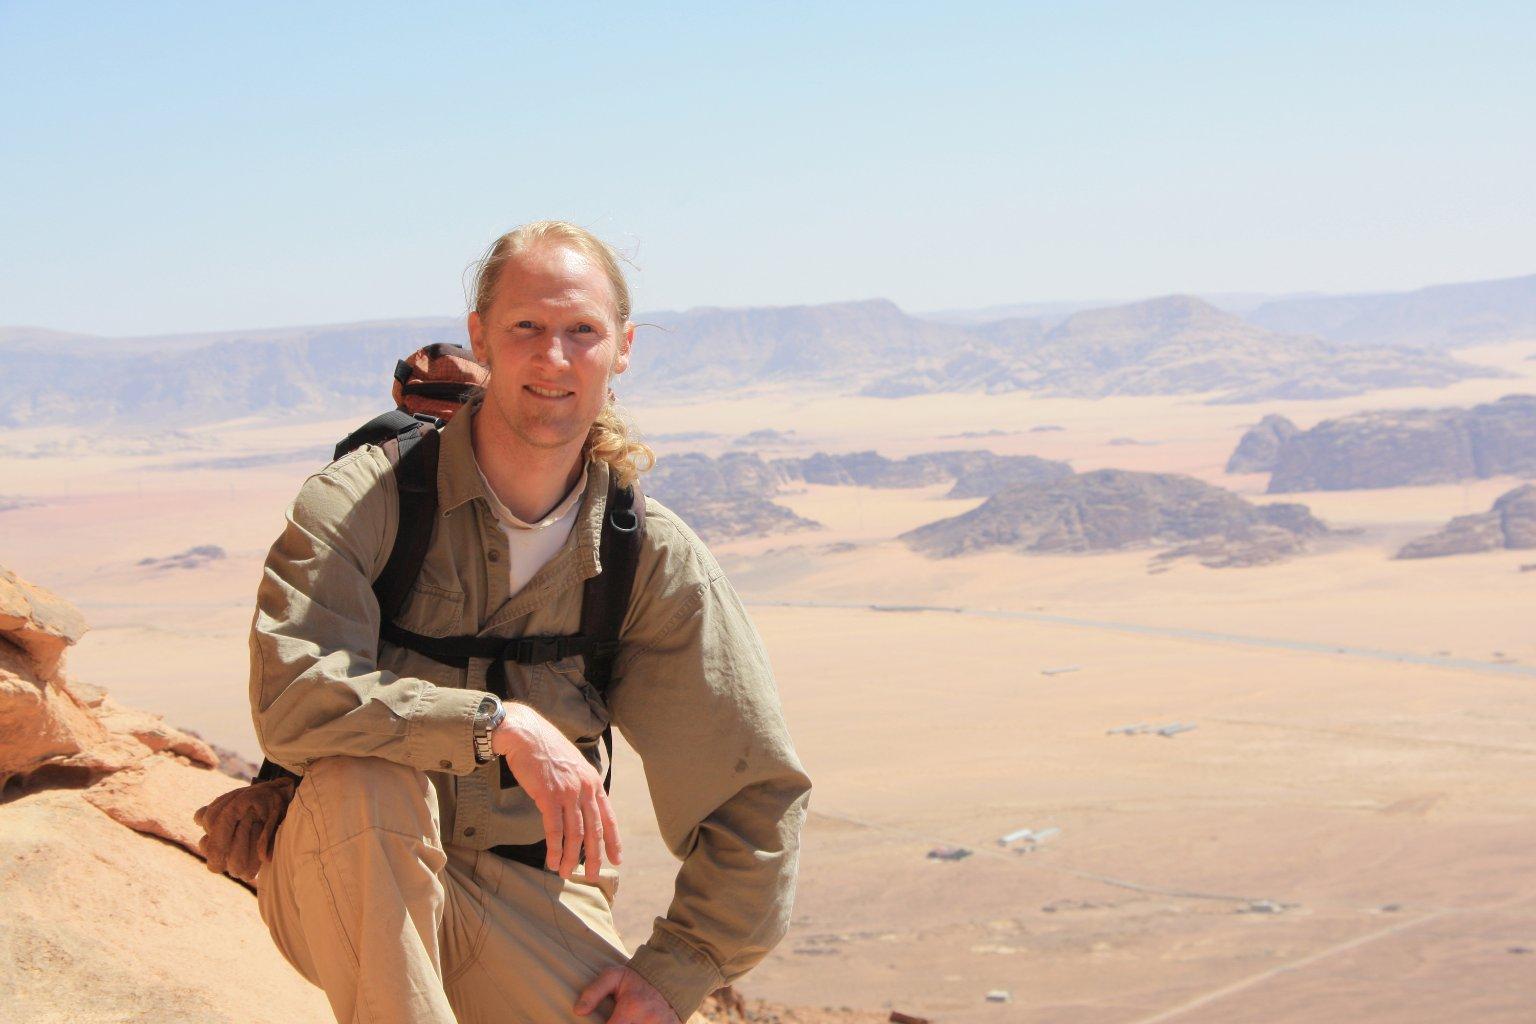 James Hagadorn in Jordan.